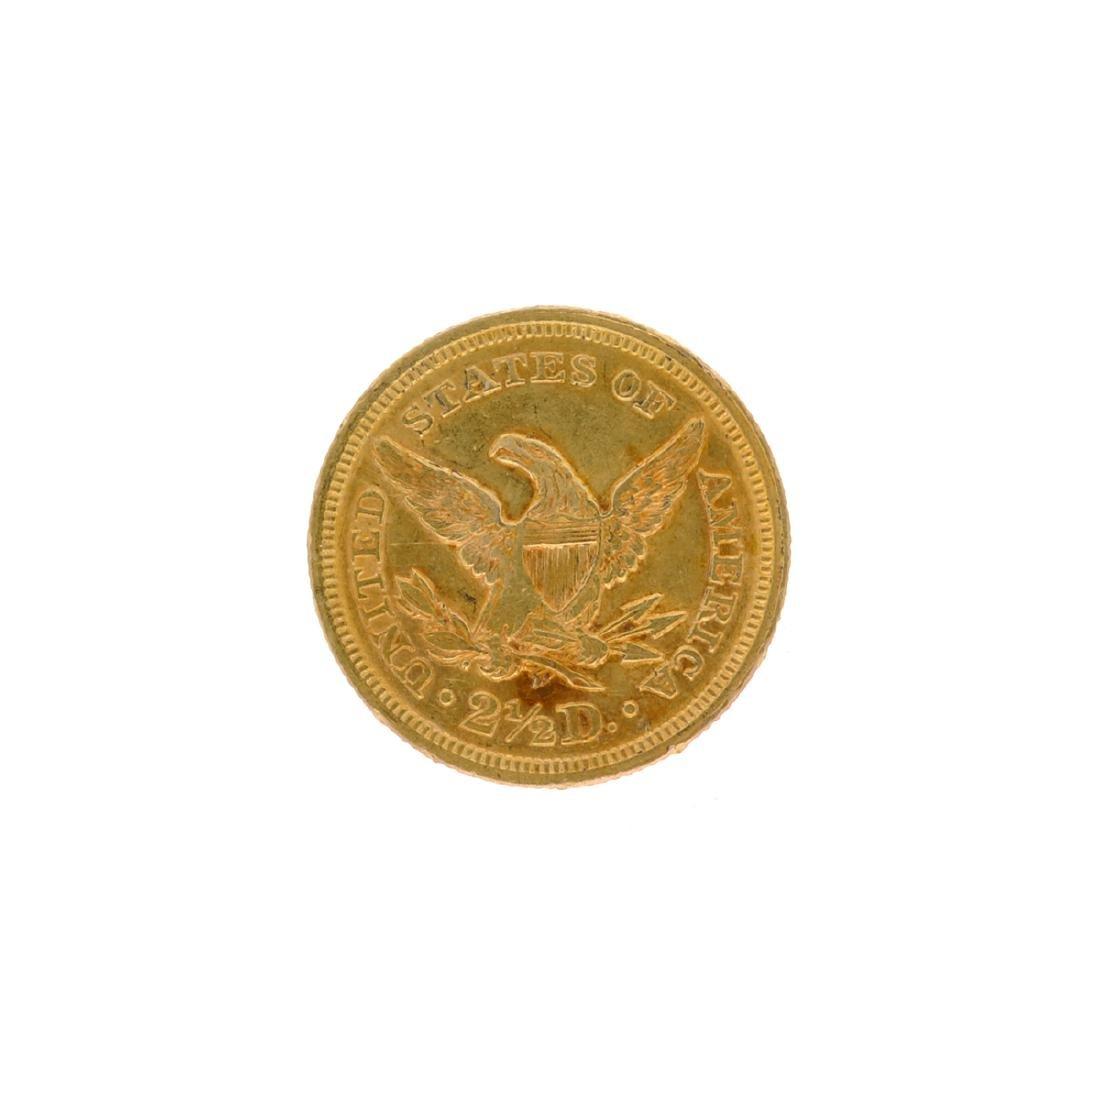 1852 $2.50 U.S. Liberty Head Gold Coin - 2